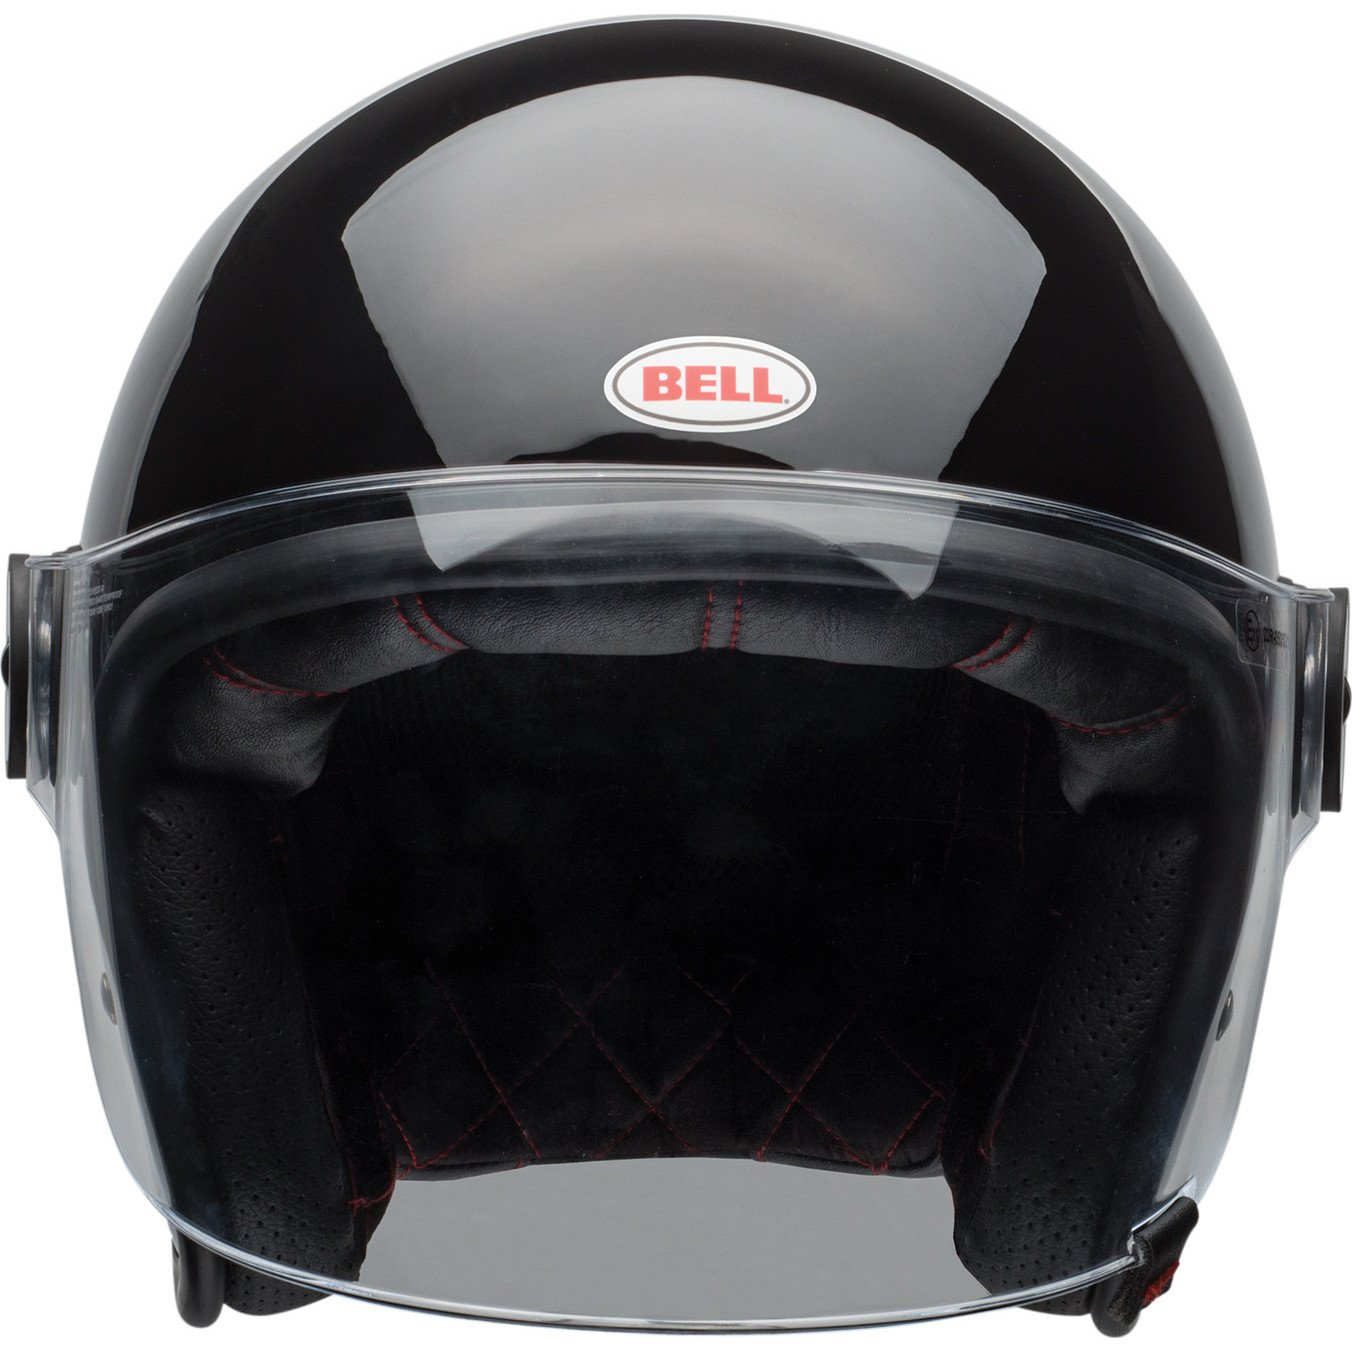 Bell Cruiser Riot Adult Helmet Matte Black